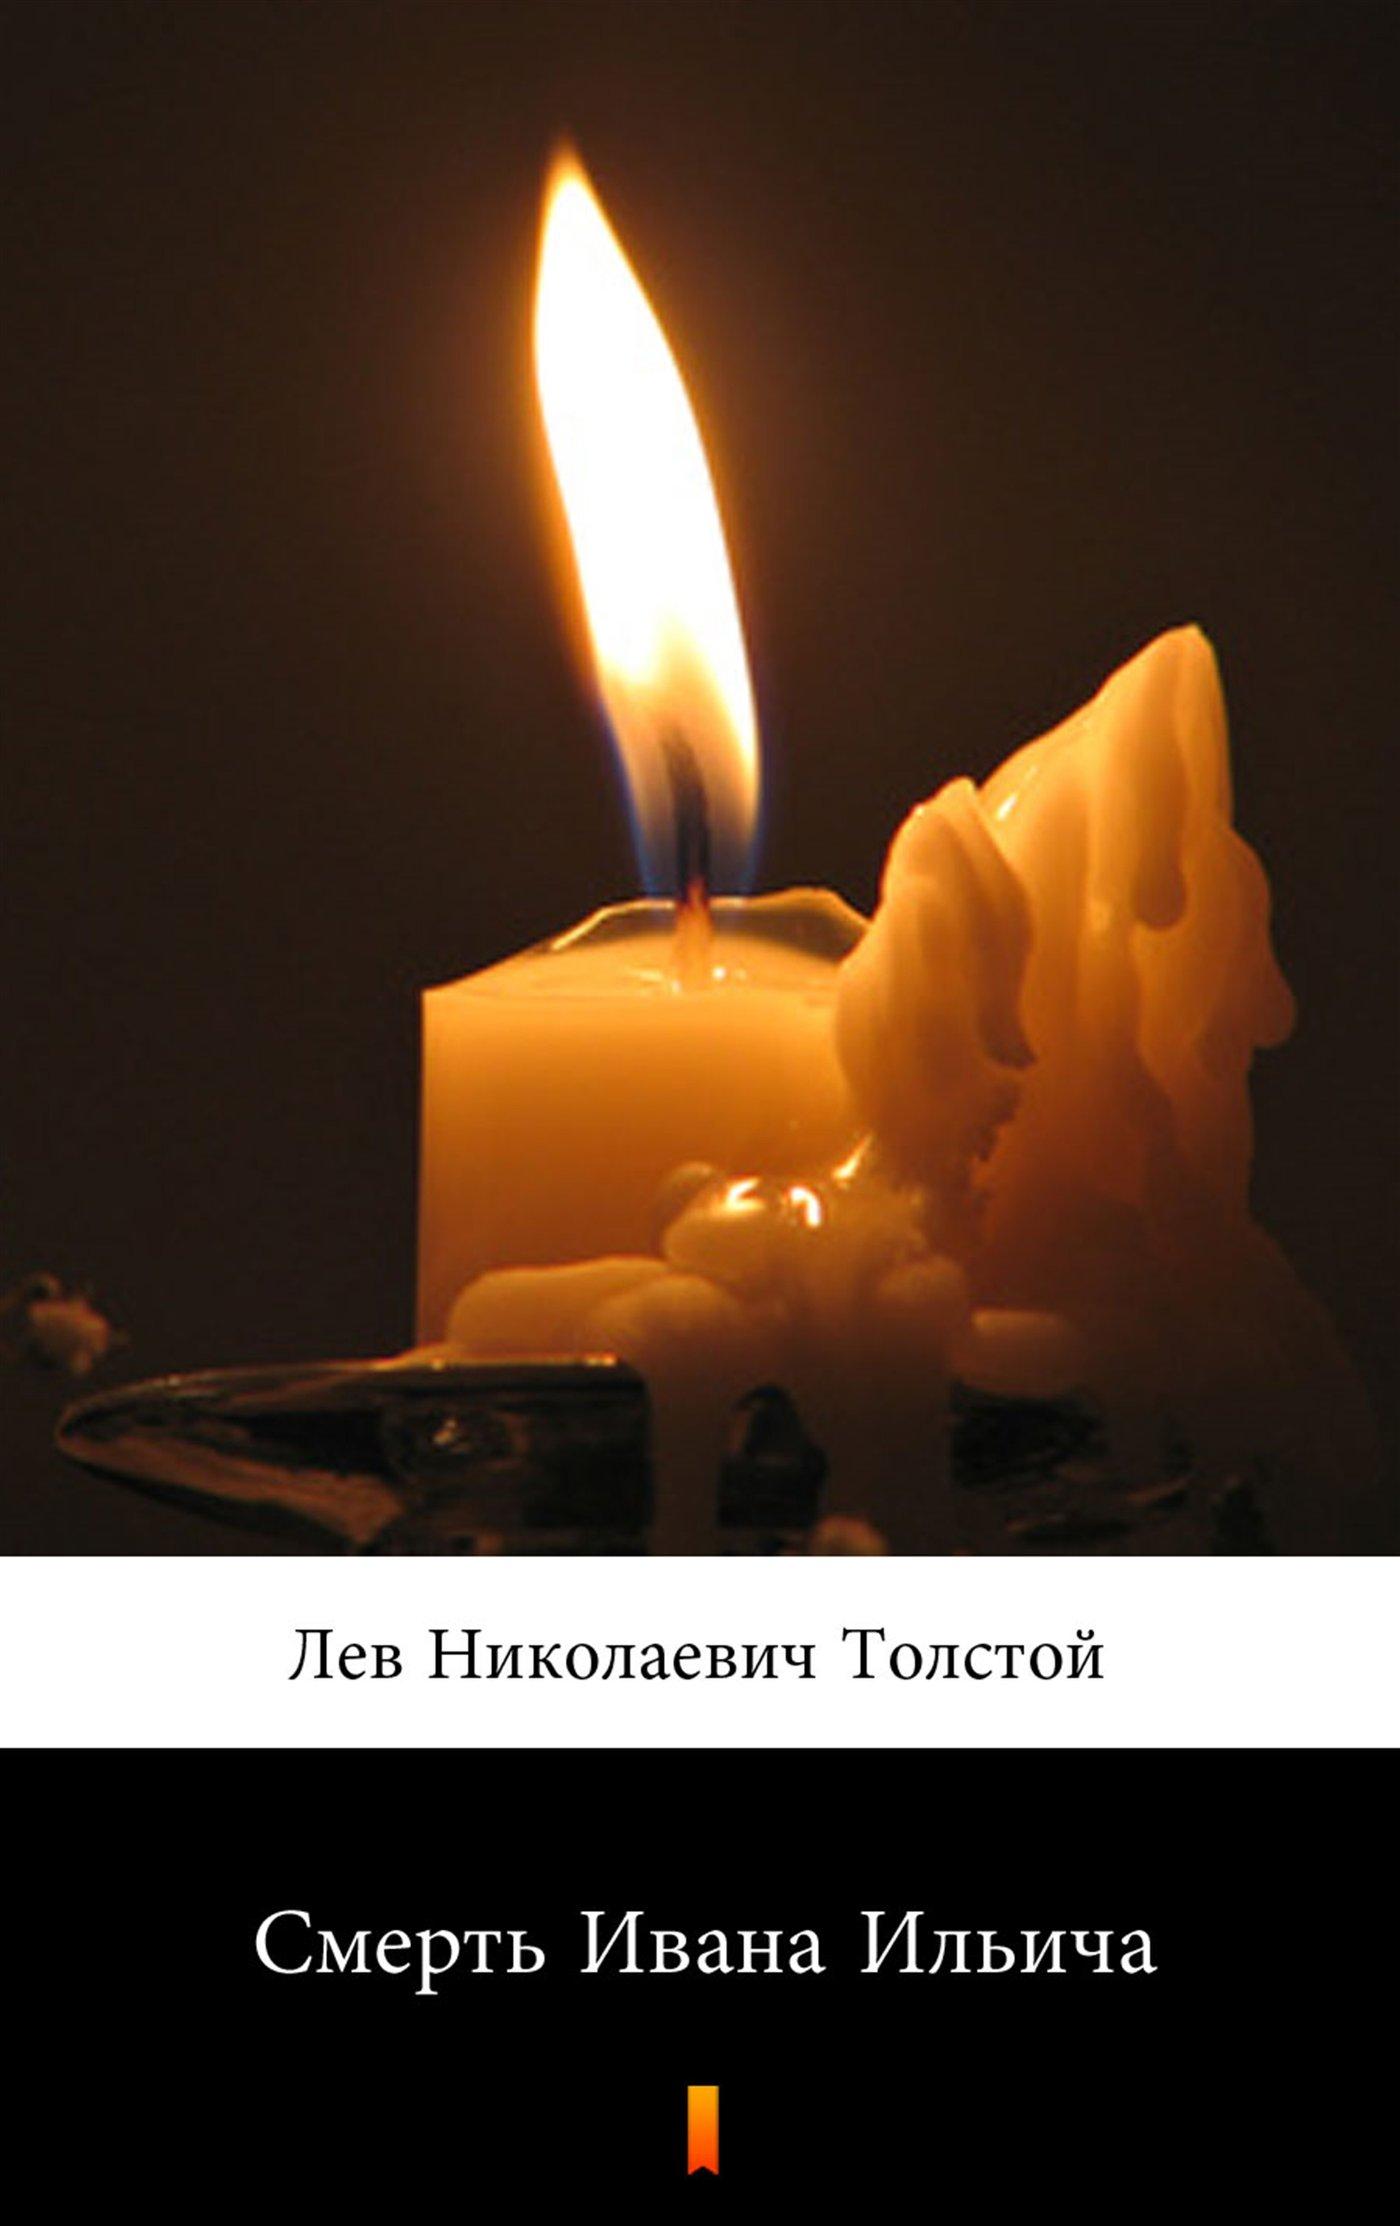 Смерть Ивана Ильича - Ebook (Książka na Kindle) do pobrania w formacie MOBI